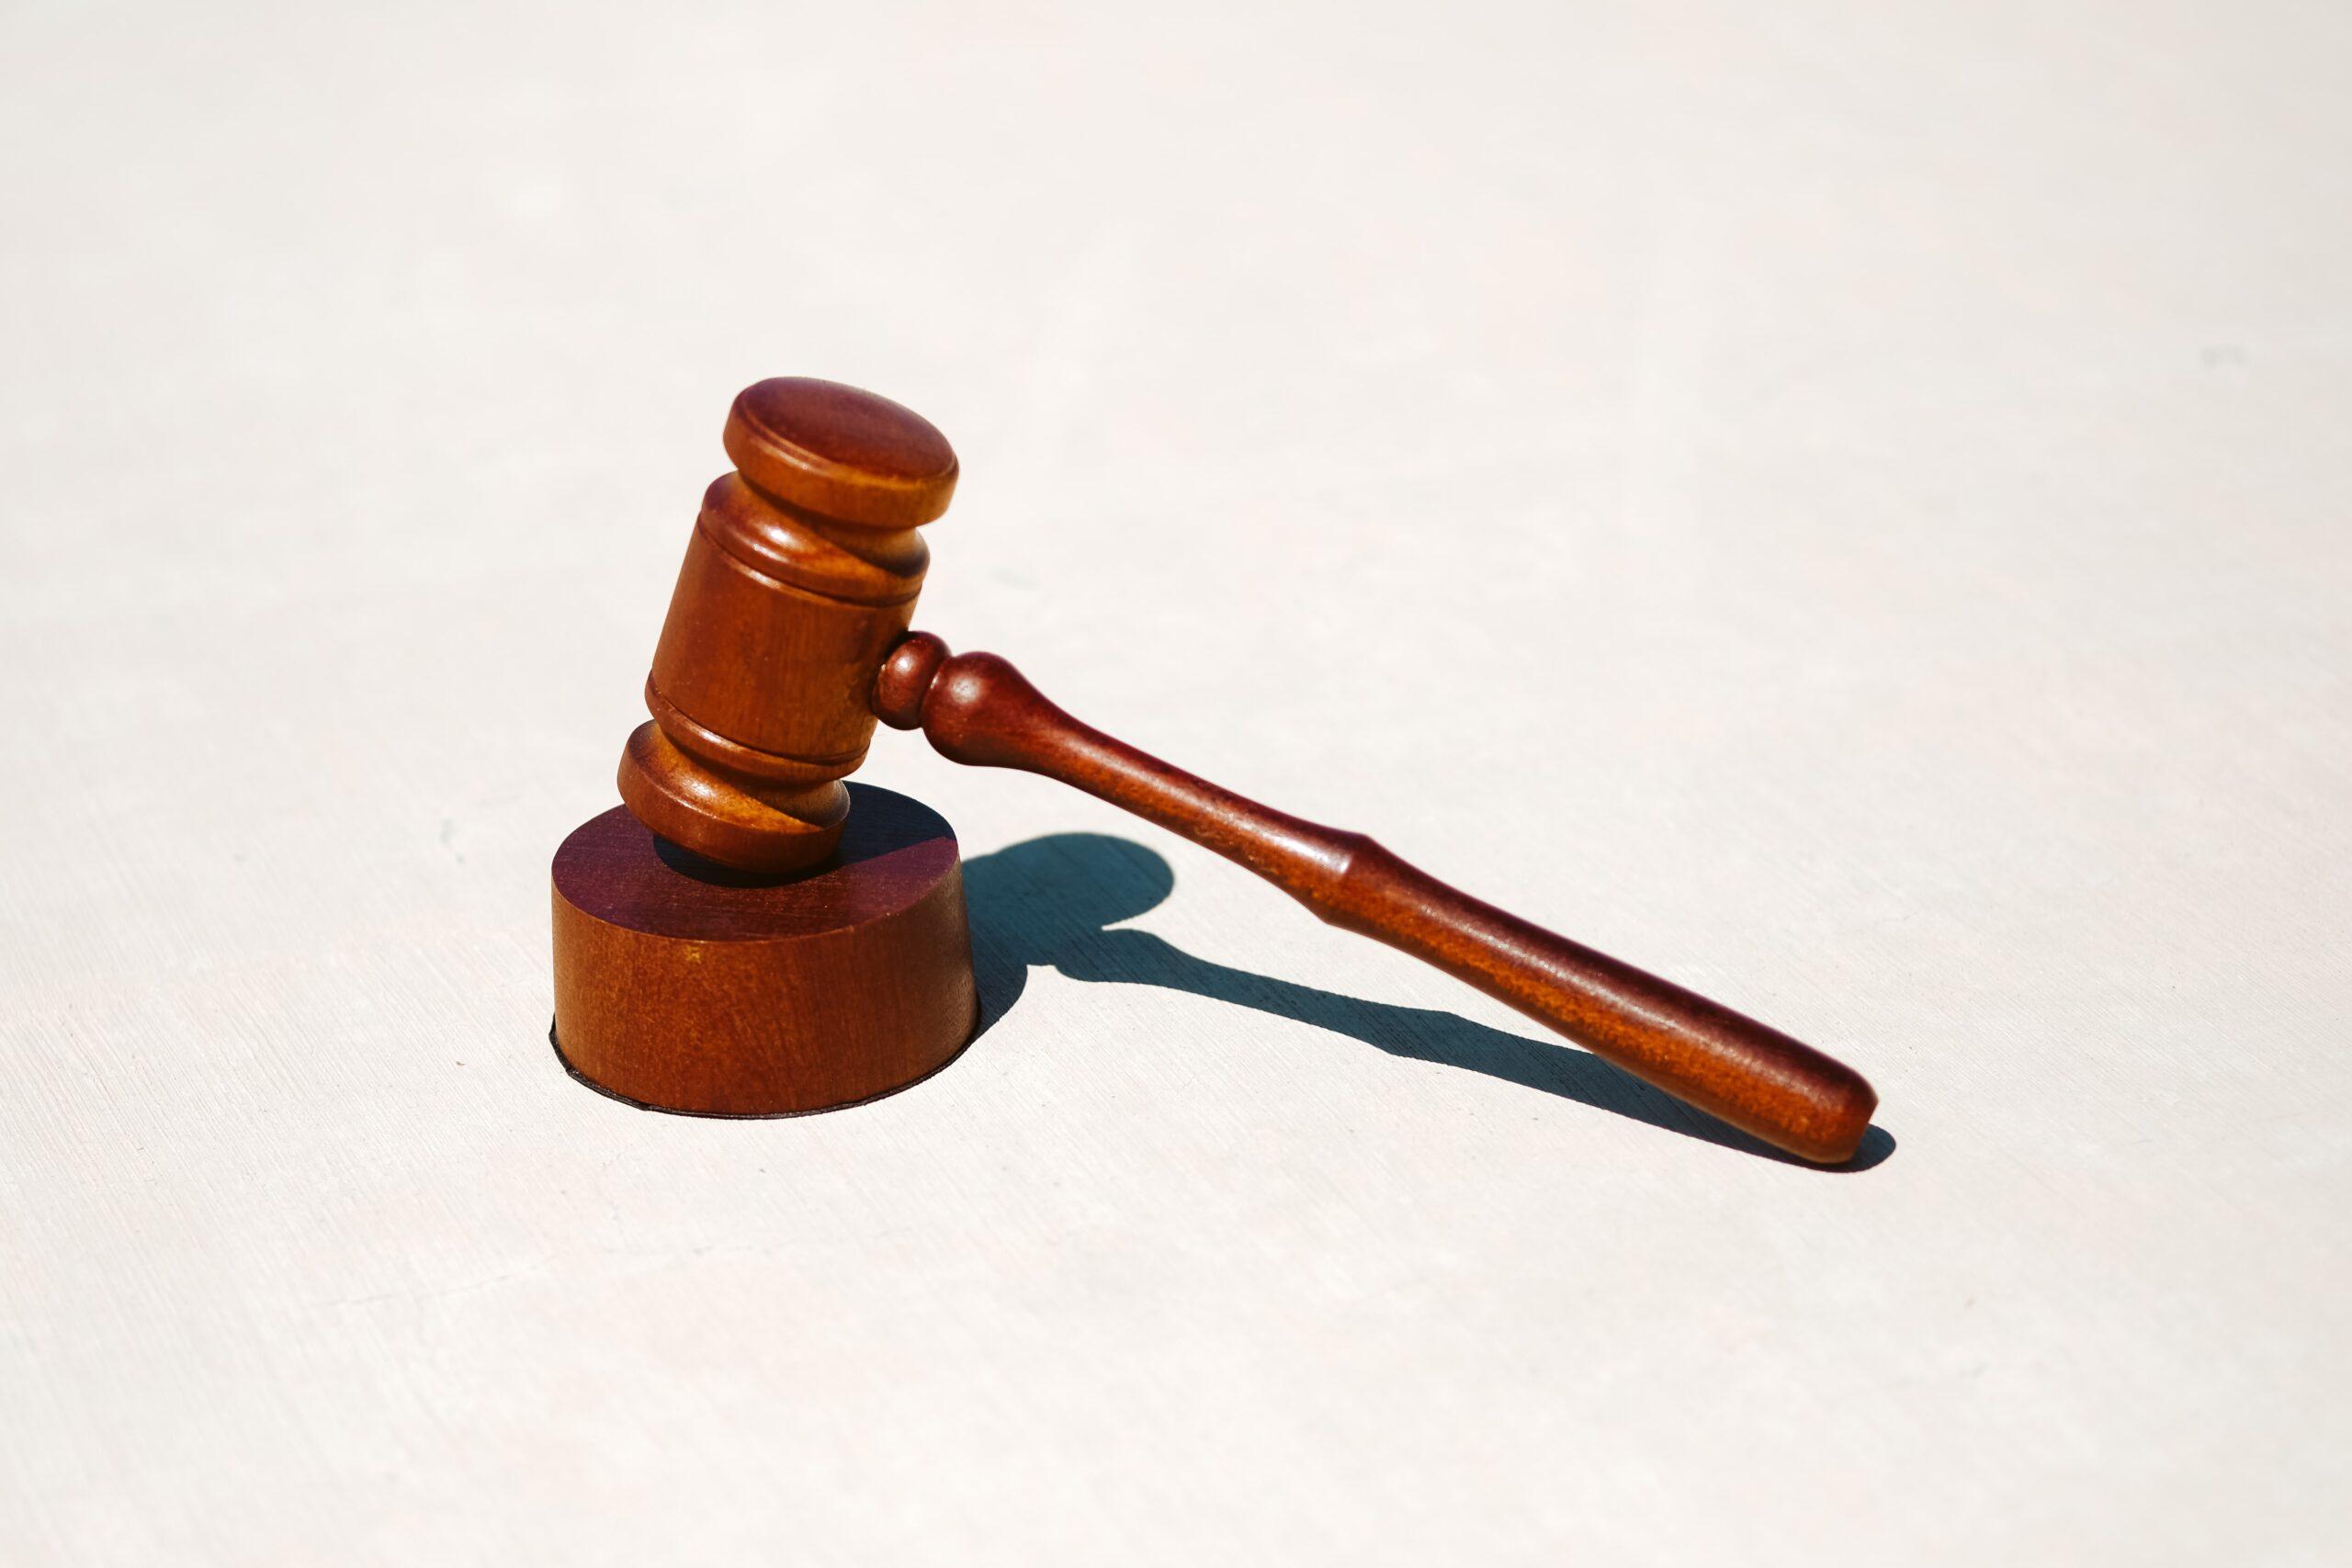 google penalty links website hammer